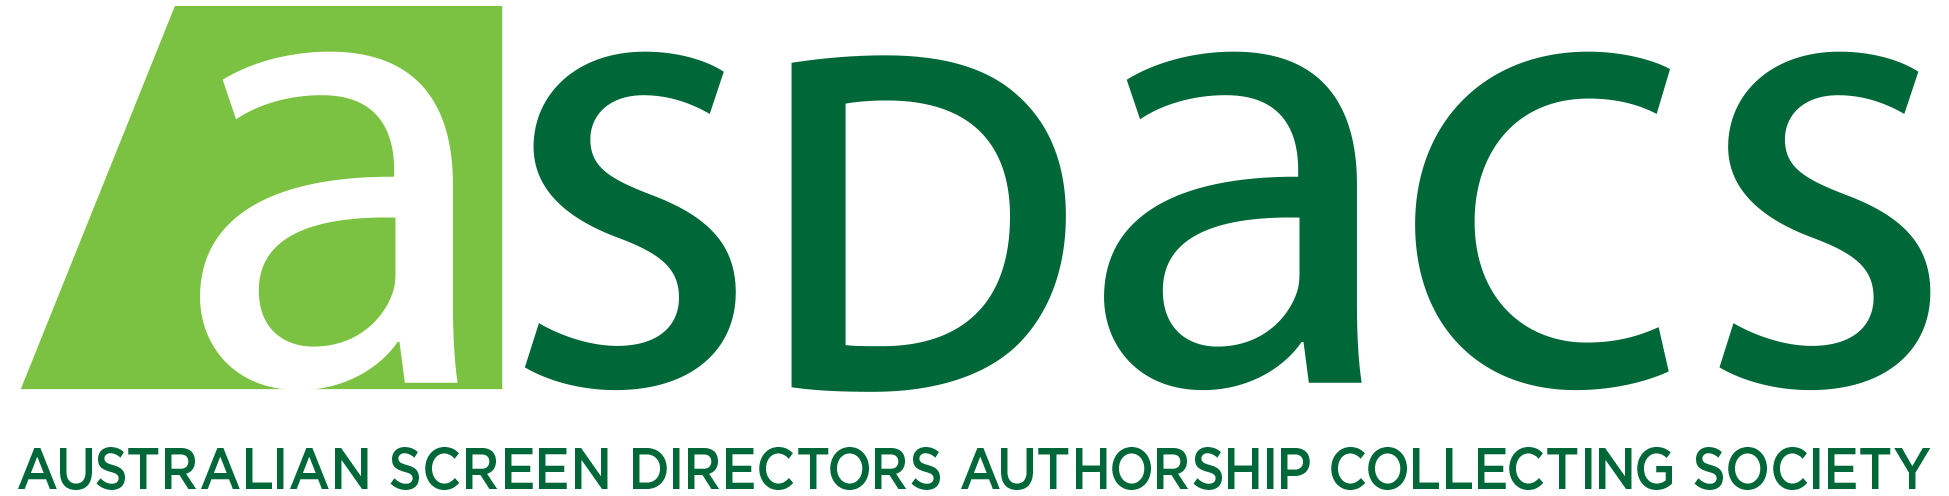 ASDACS - Australian Screen Directors Authorship Collecting Society